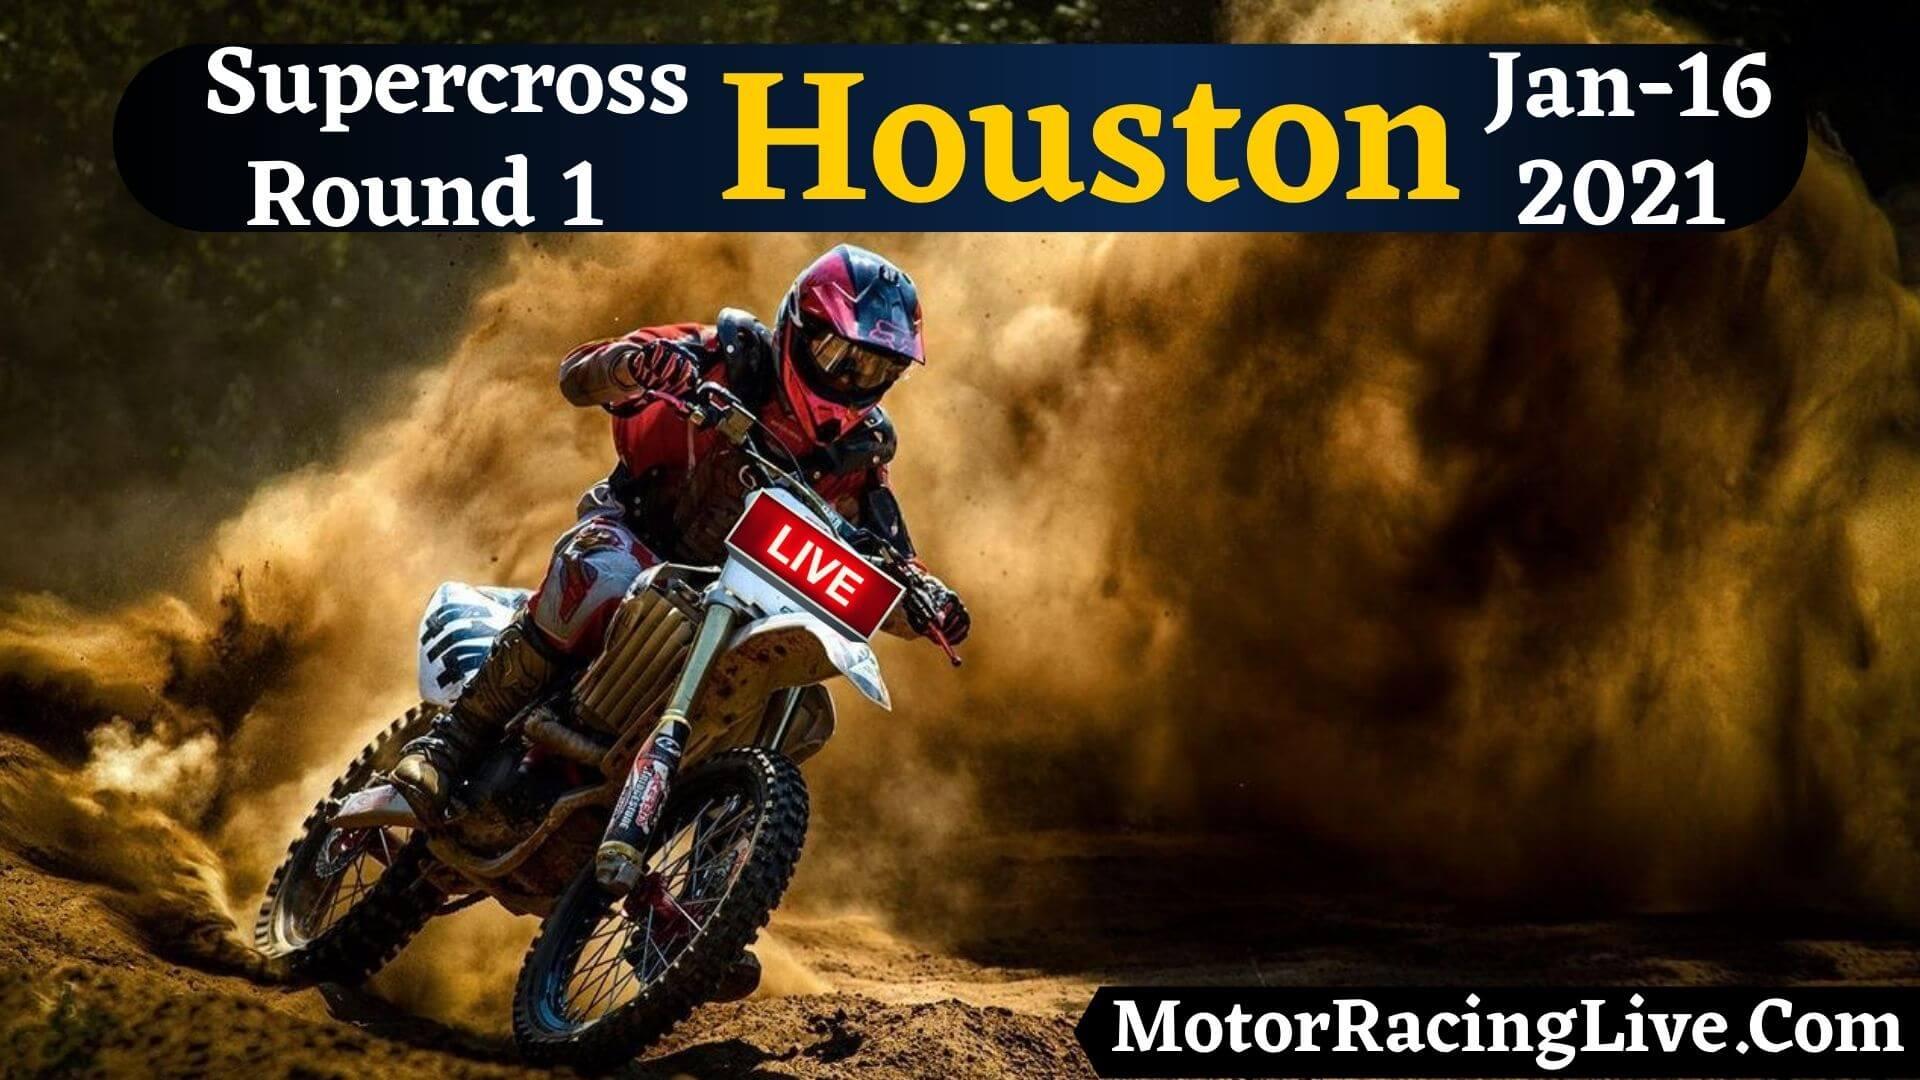 Supercross Houston Round 1 Live Stream